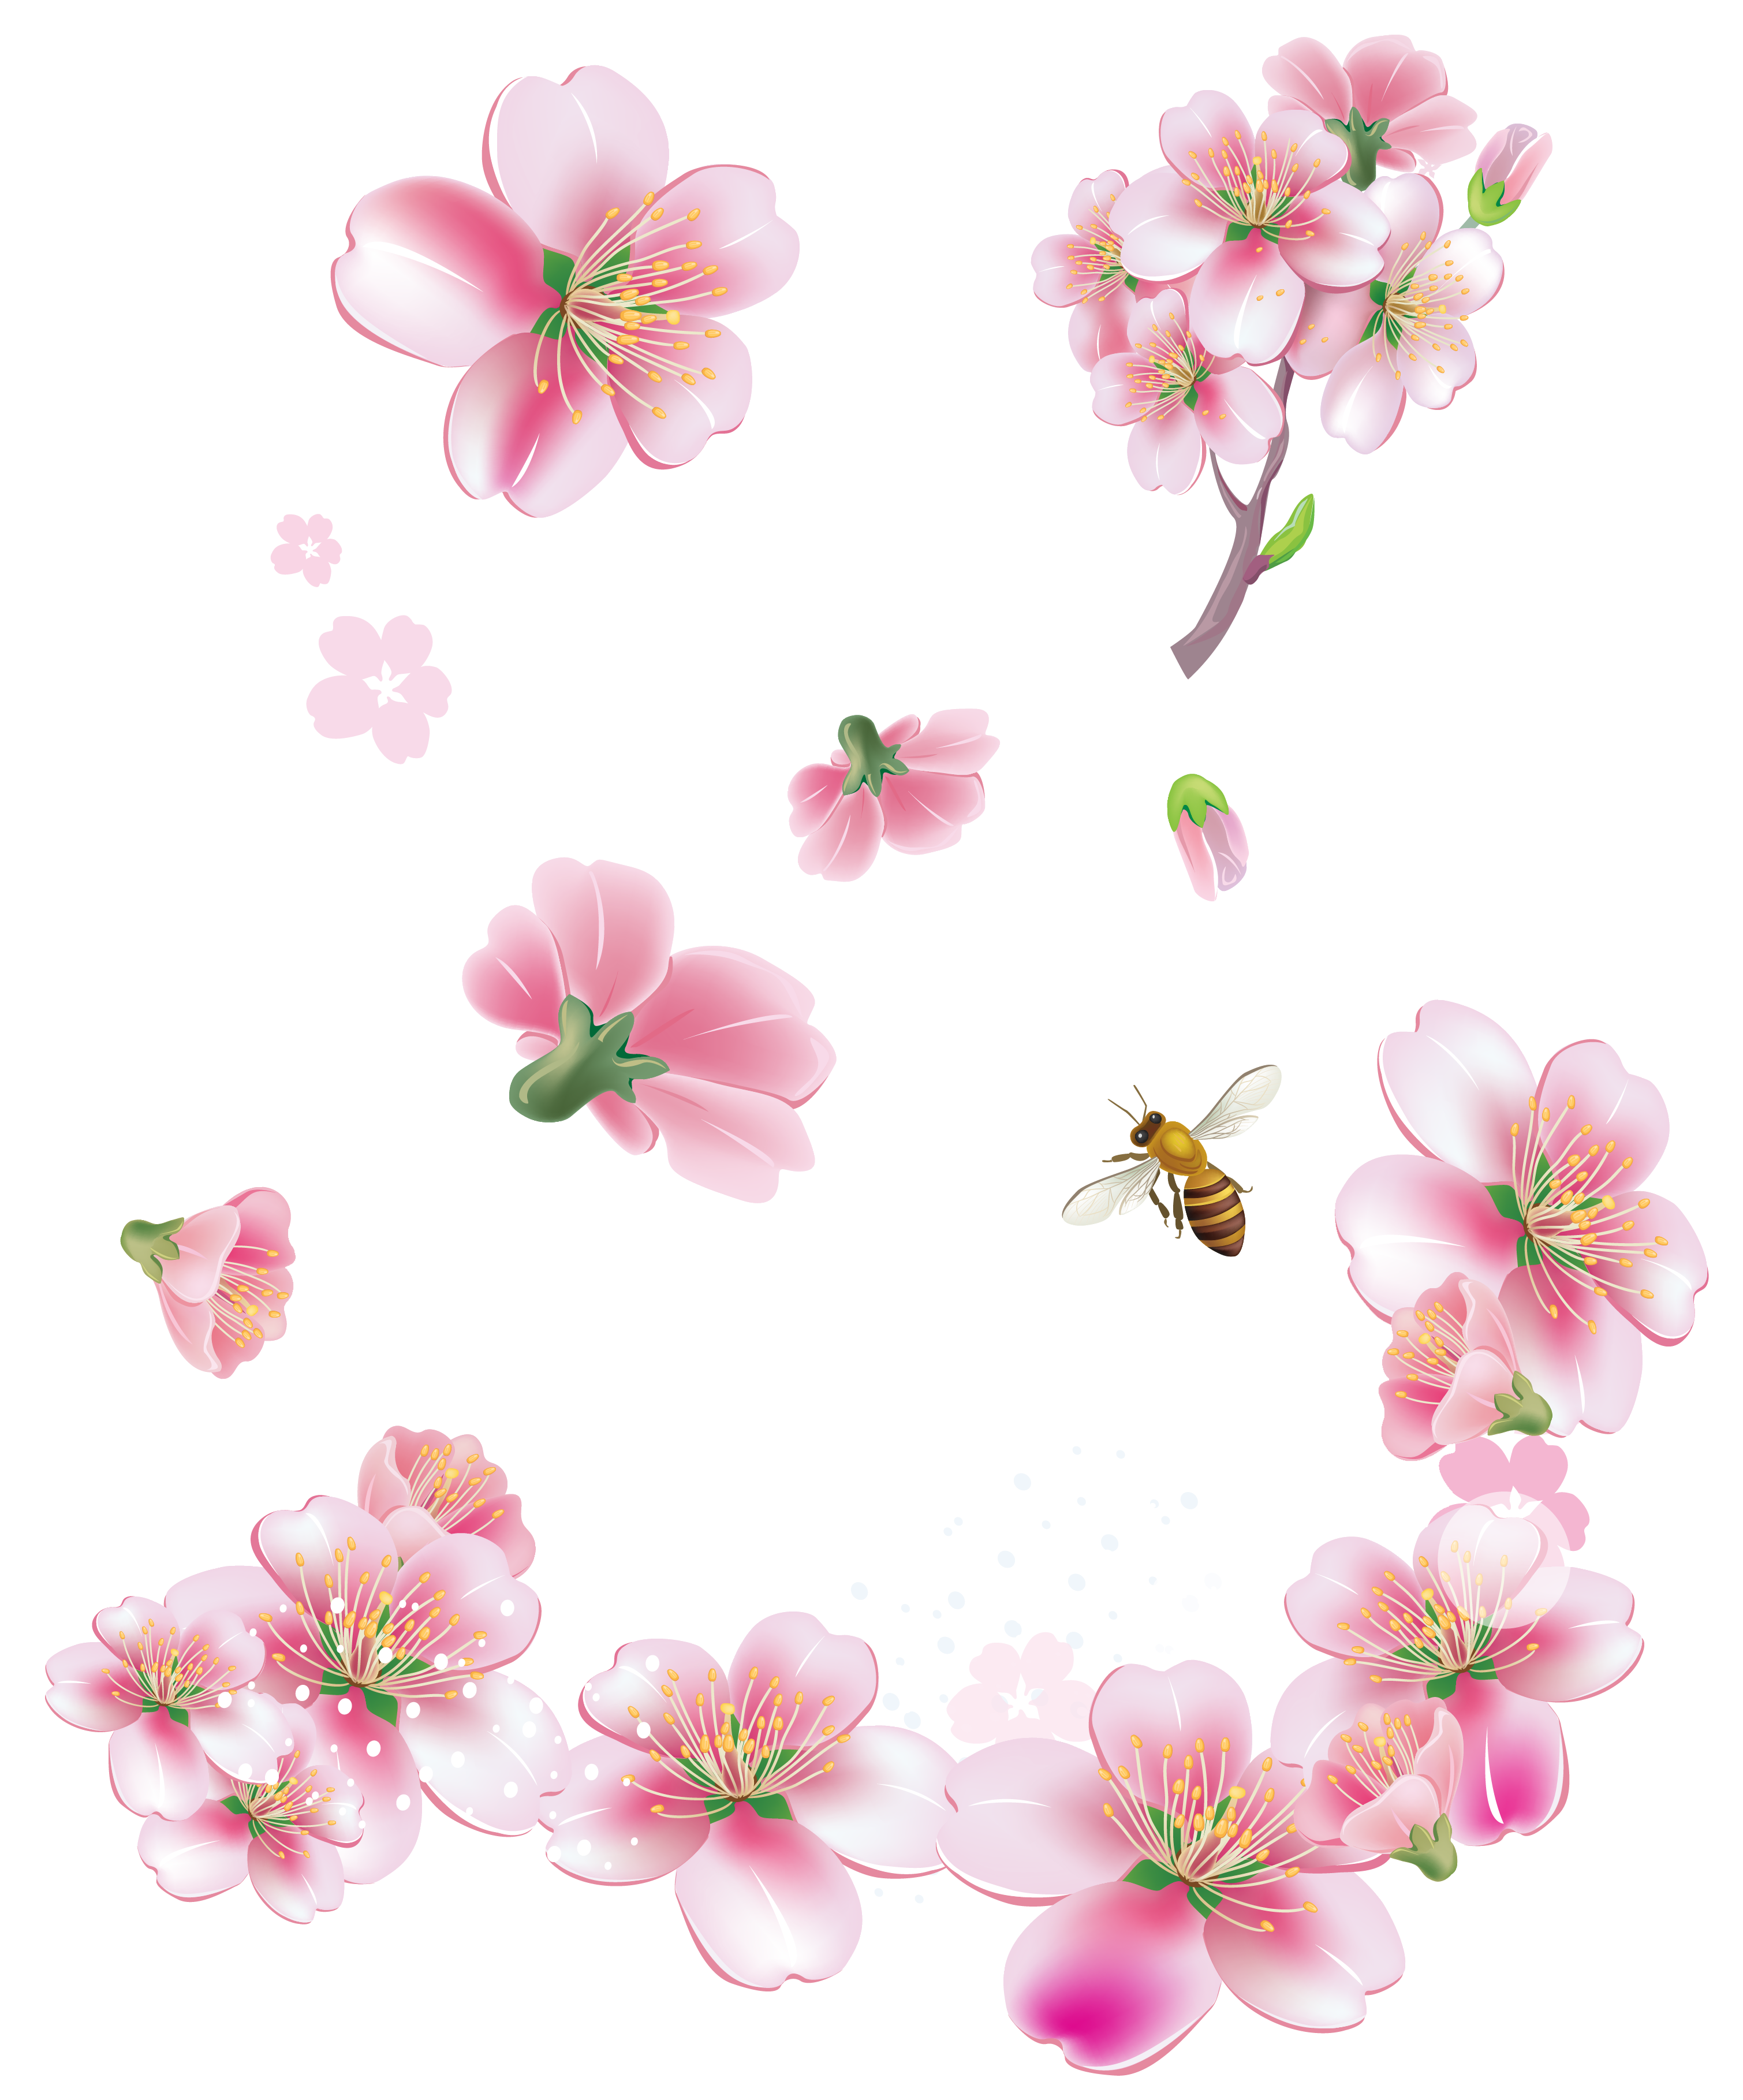 Whisper clipart no secret. Pink flowers clip art